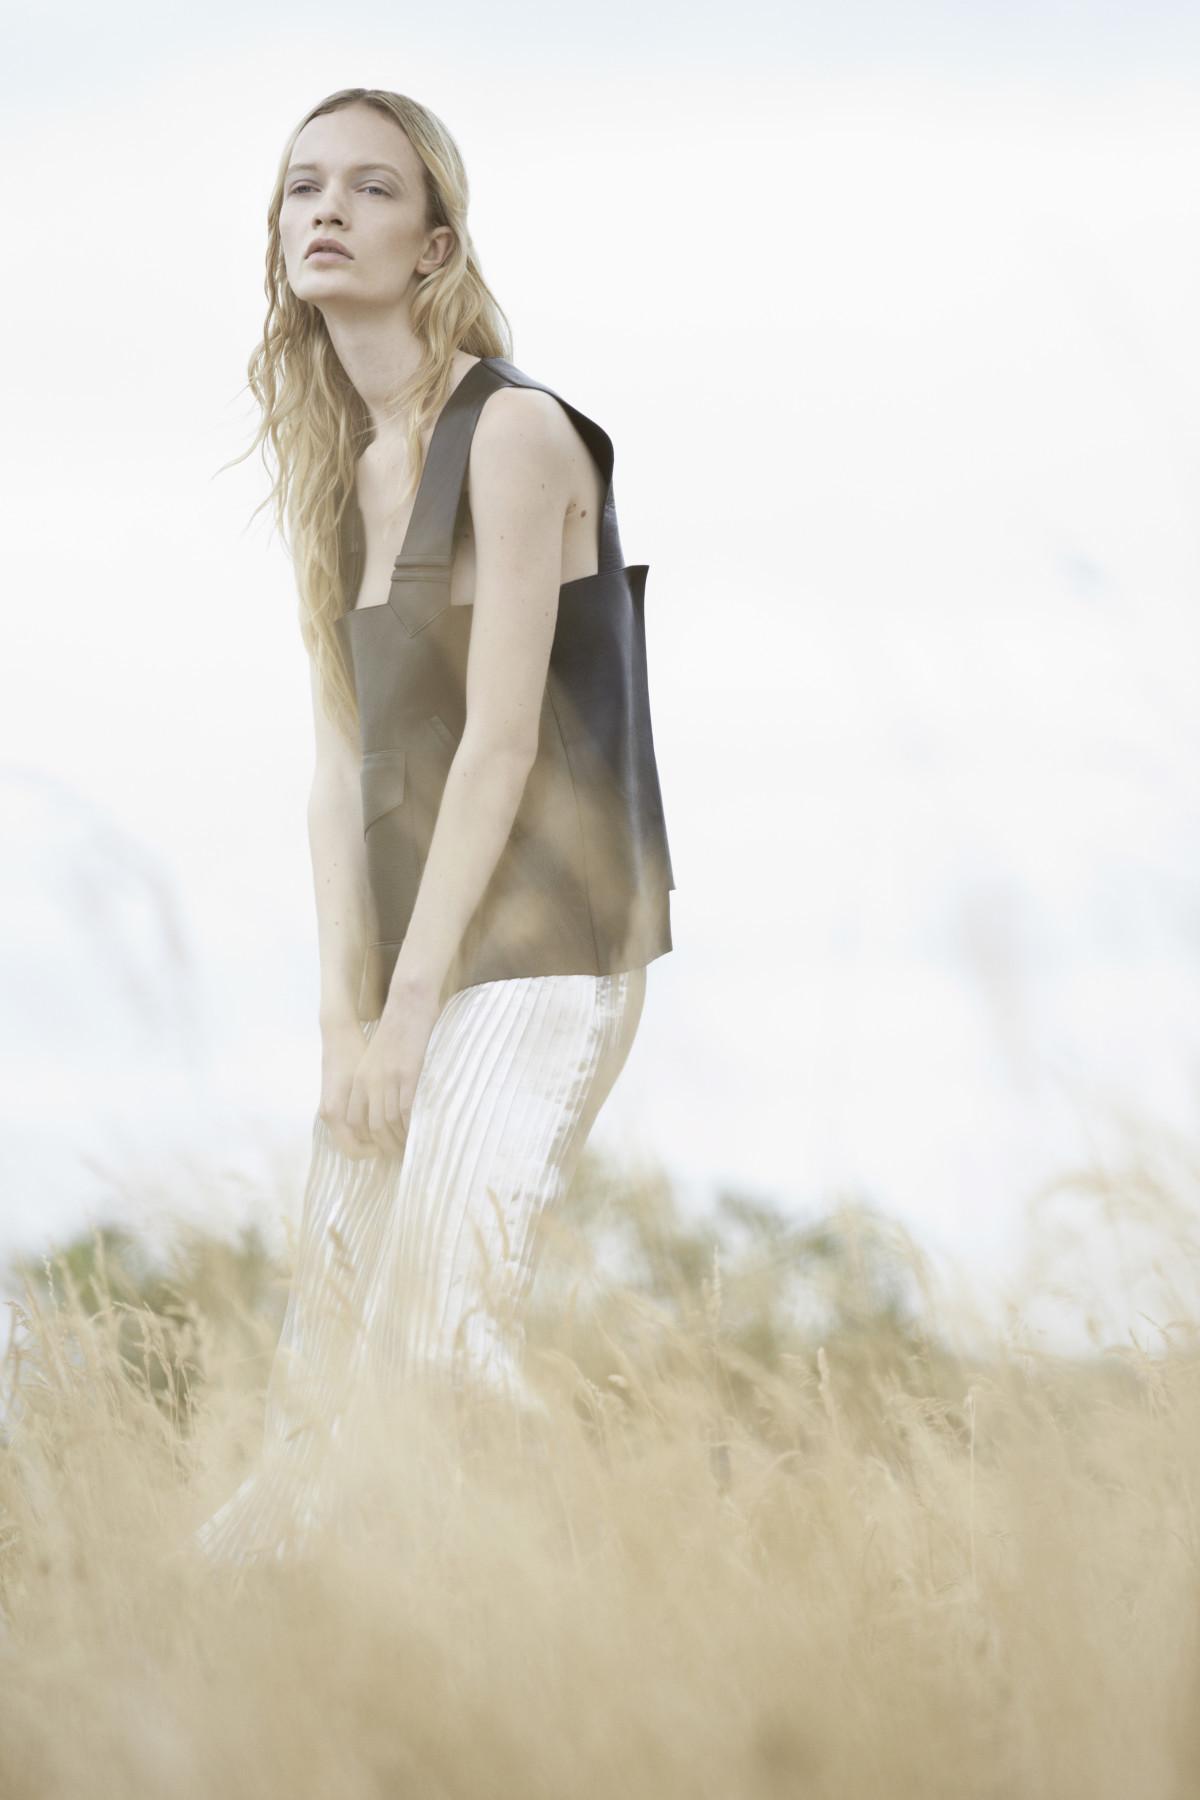 Schon Magazine, Philip Blythman, Through the Grass, Ida Dyberg,